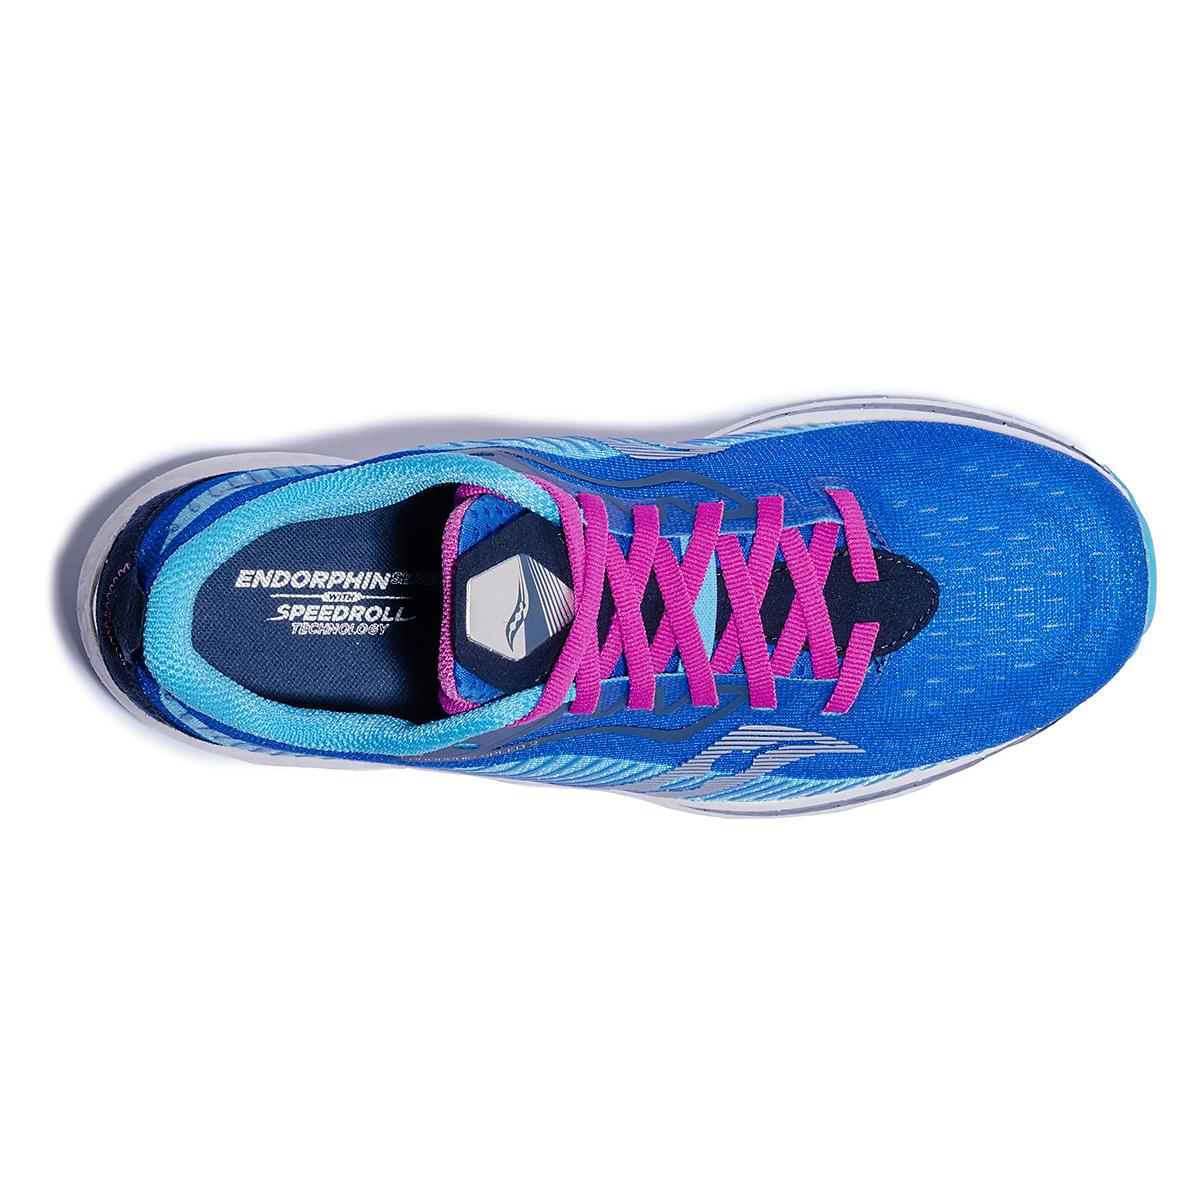 Women's Saucony Endorphin Speed 2 Running Shoe - Color: Royal / Blaze - Size: 5 - Width: Regular, Royal / Blaze, large, image 3